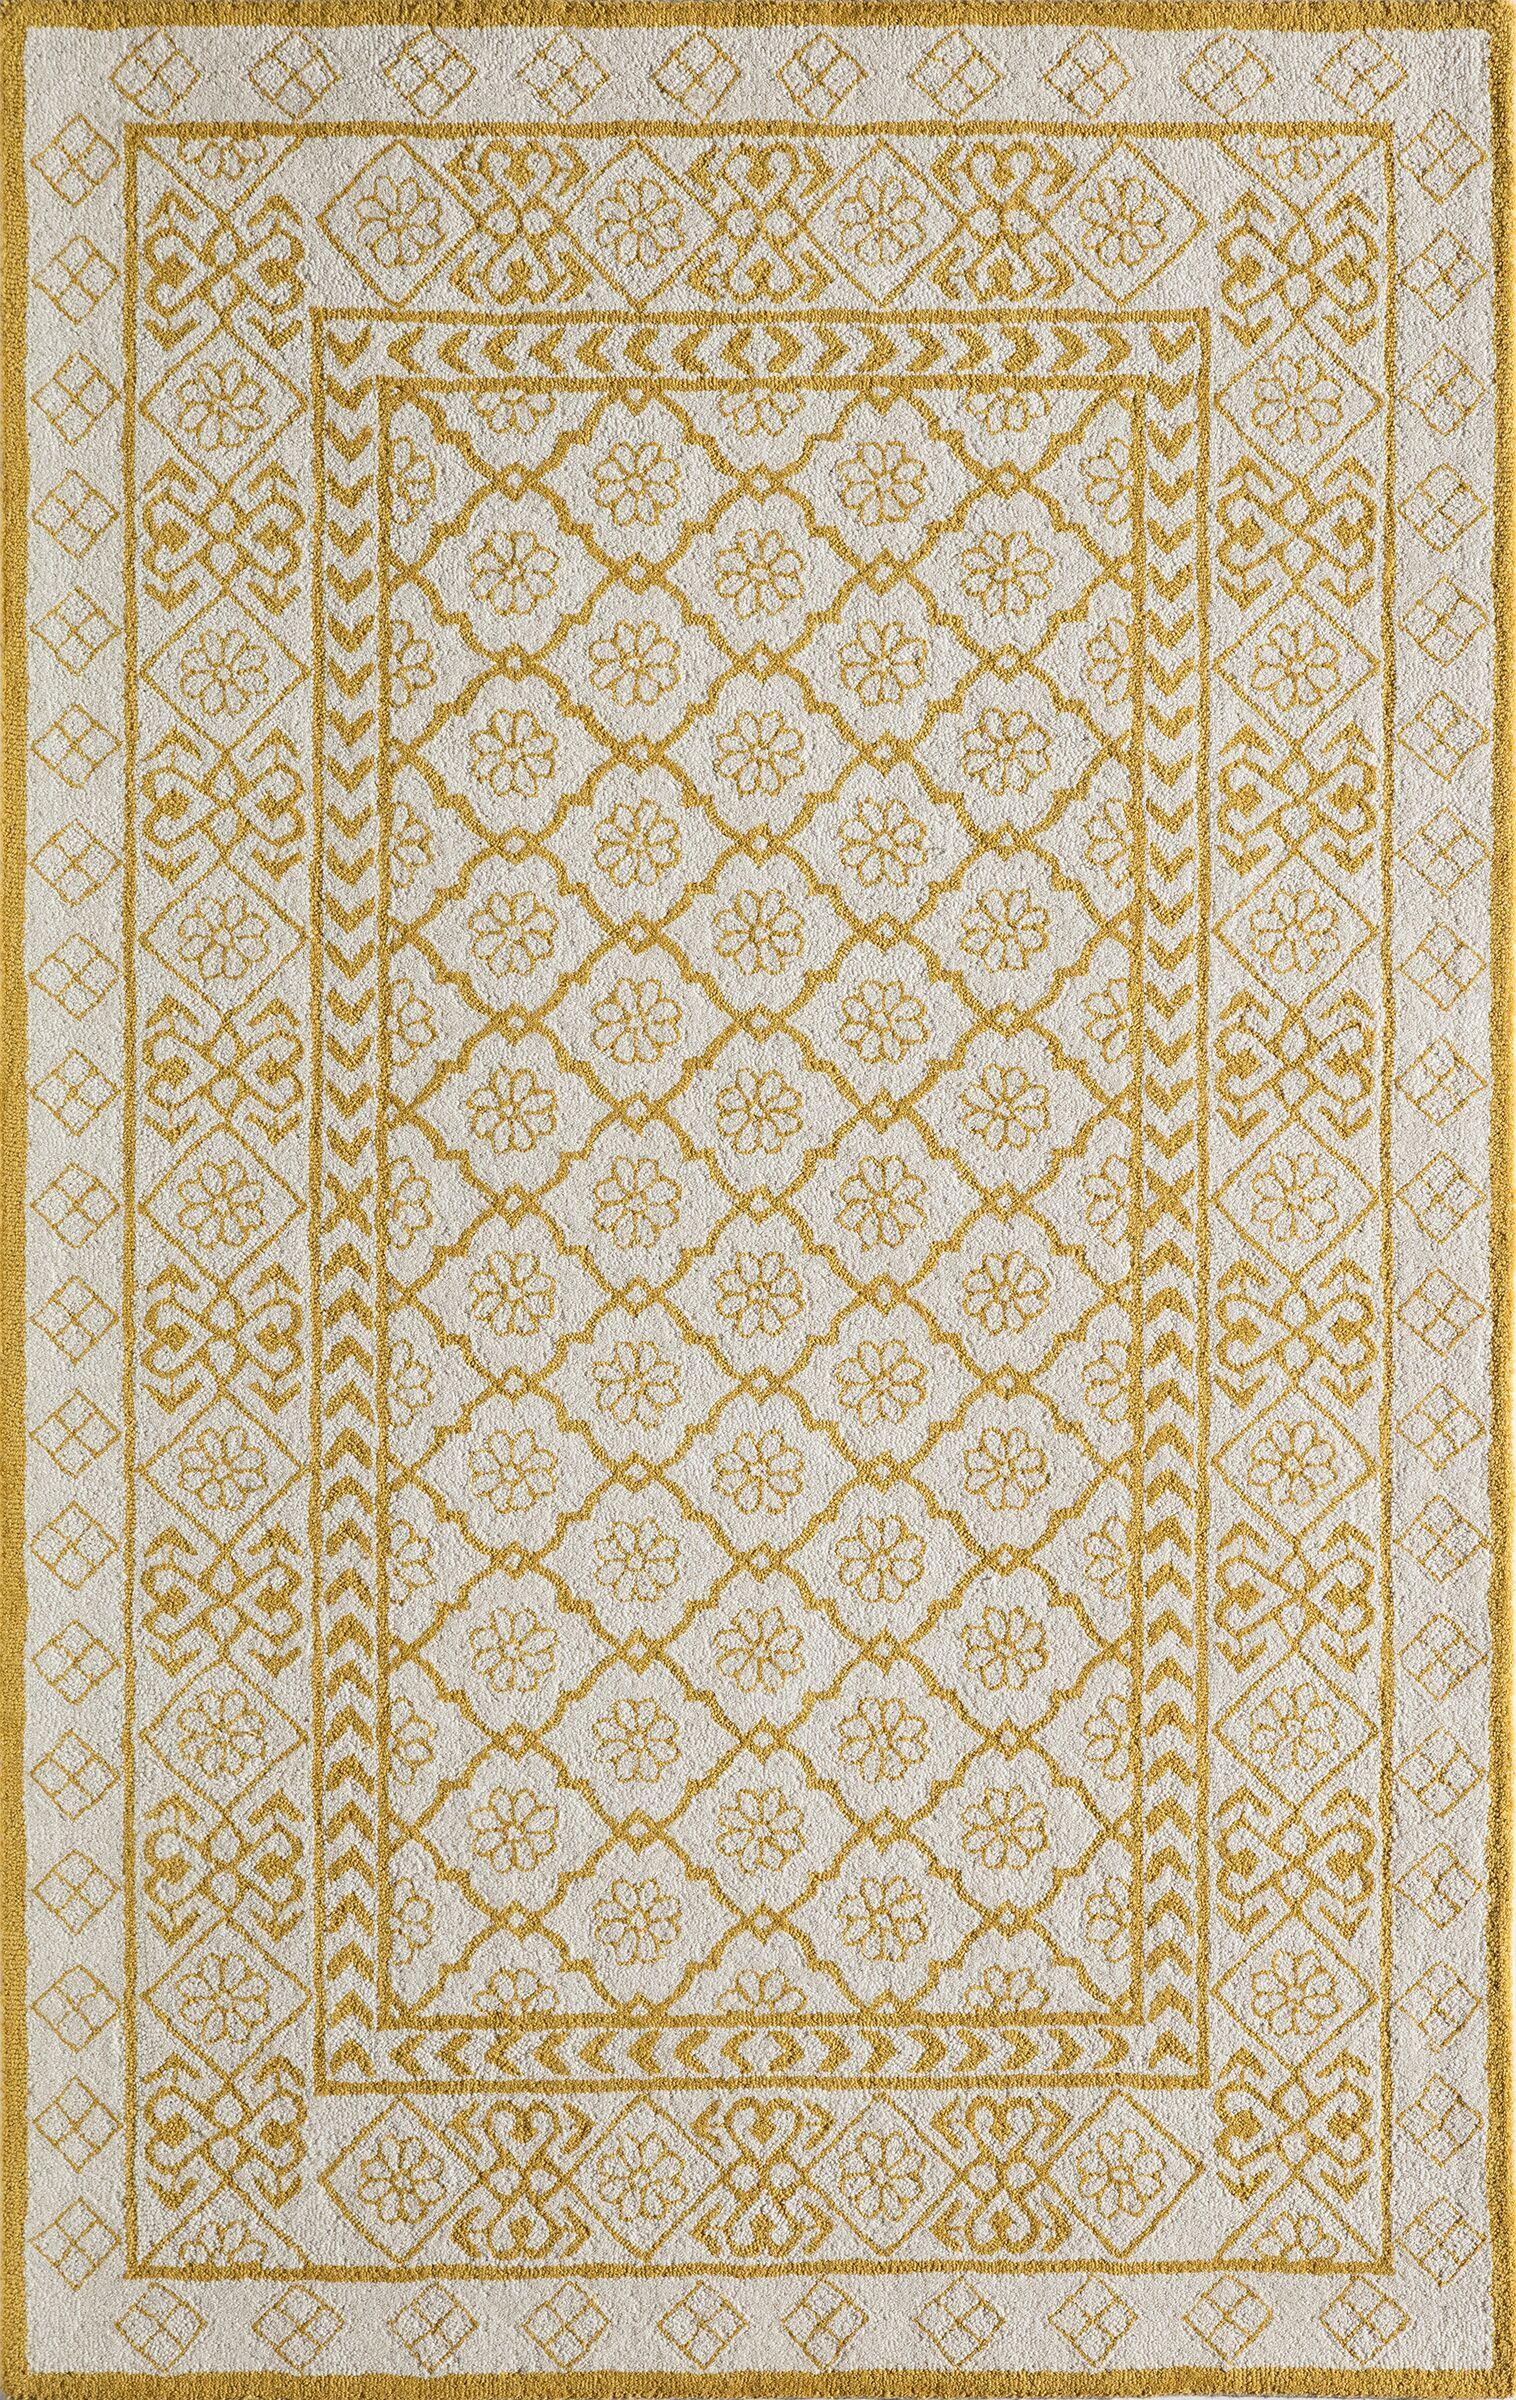 Anaya Hand-Hooked Gold/White Area Rug Rug Size: Rectangle 3'9